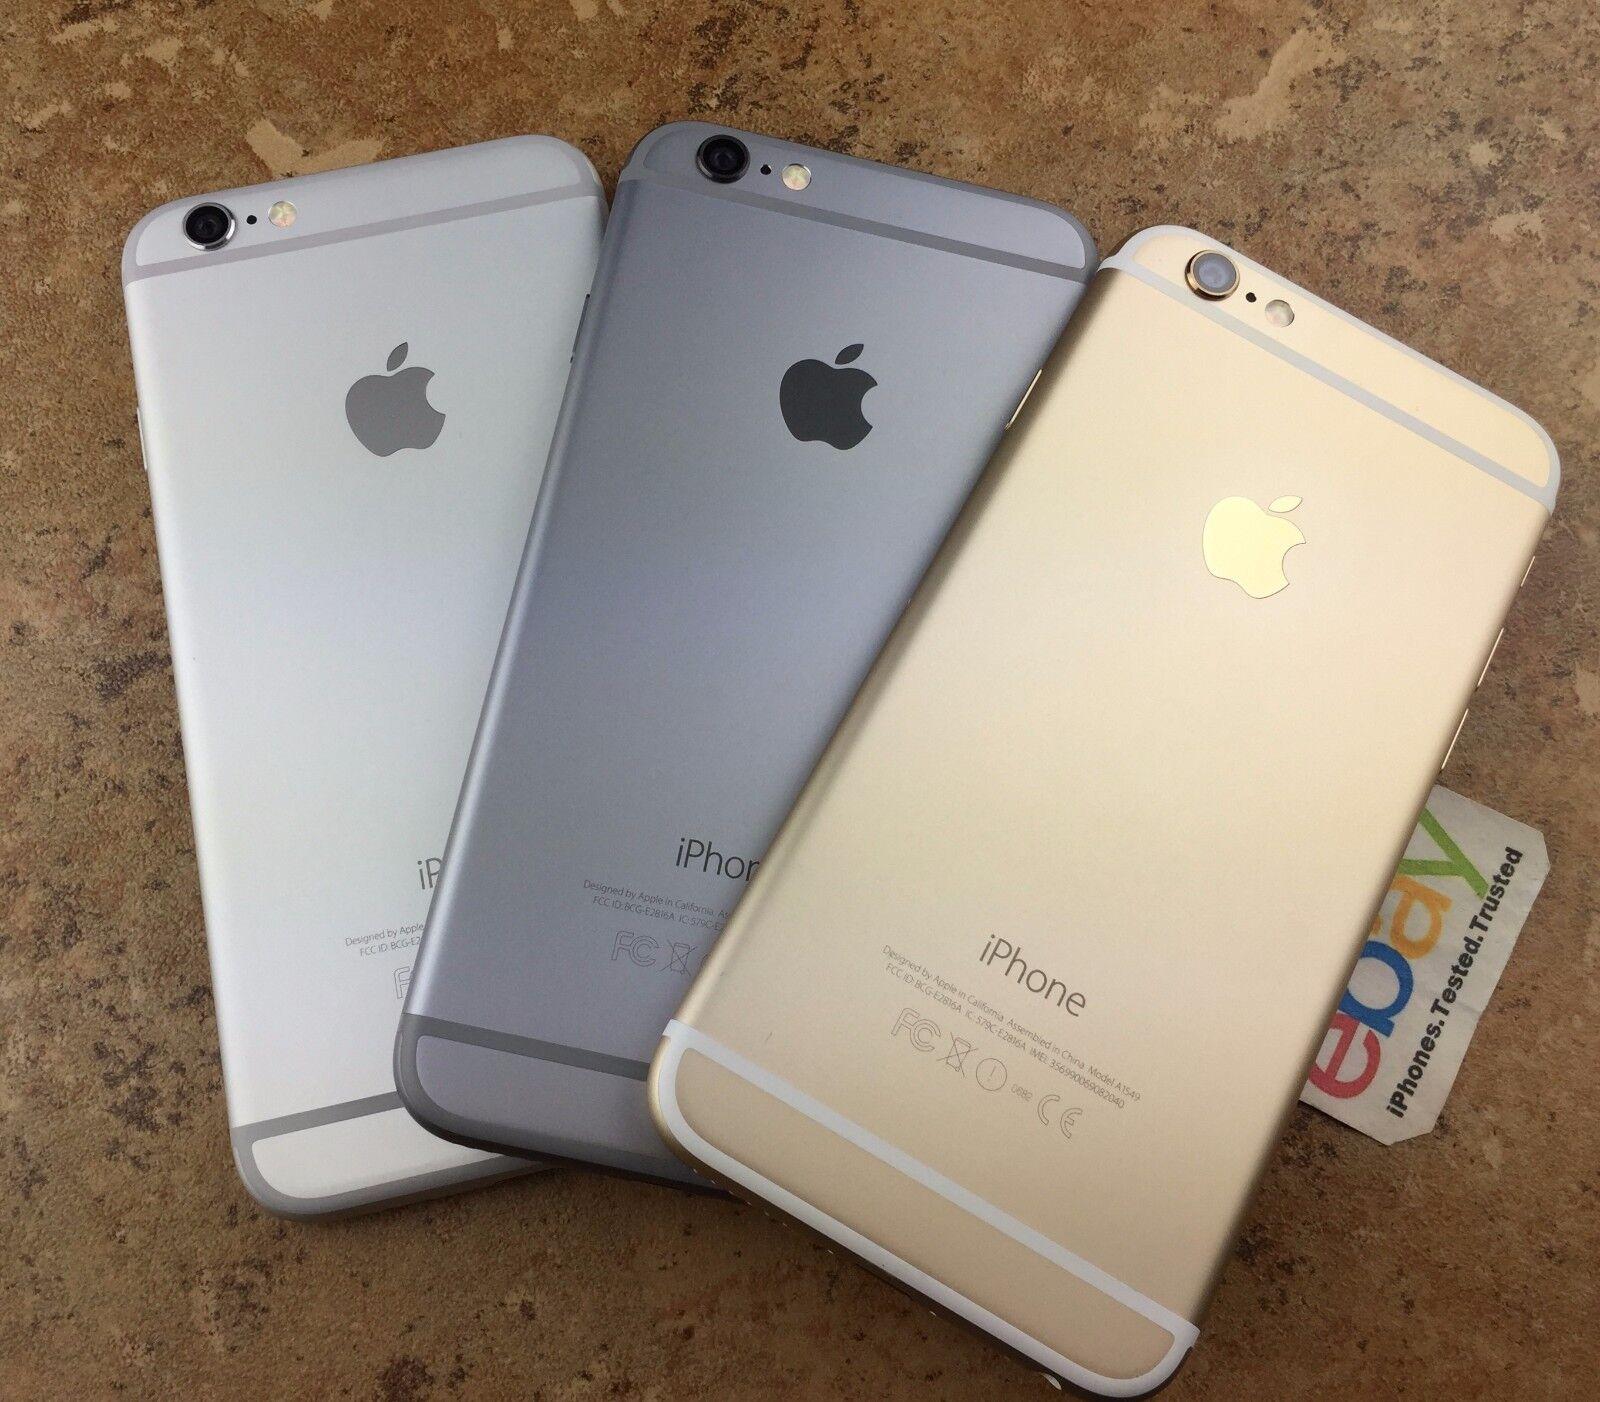 $206.00 - Factory Unlocked Apple iPhone 6 Gold Silver Space Gray ATT TMobile 16/64GB/128GB